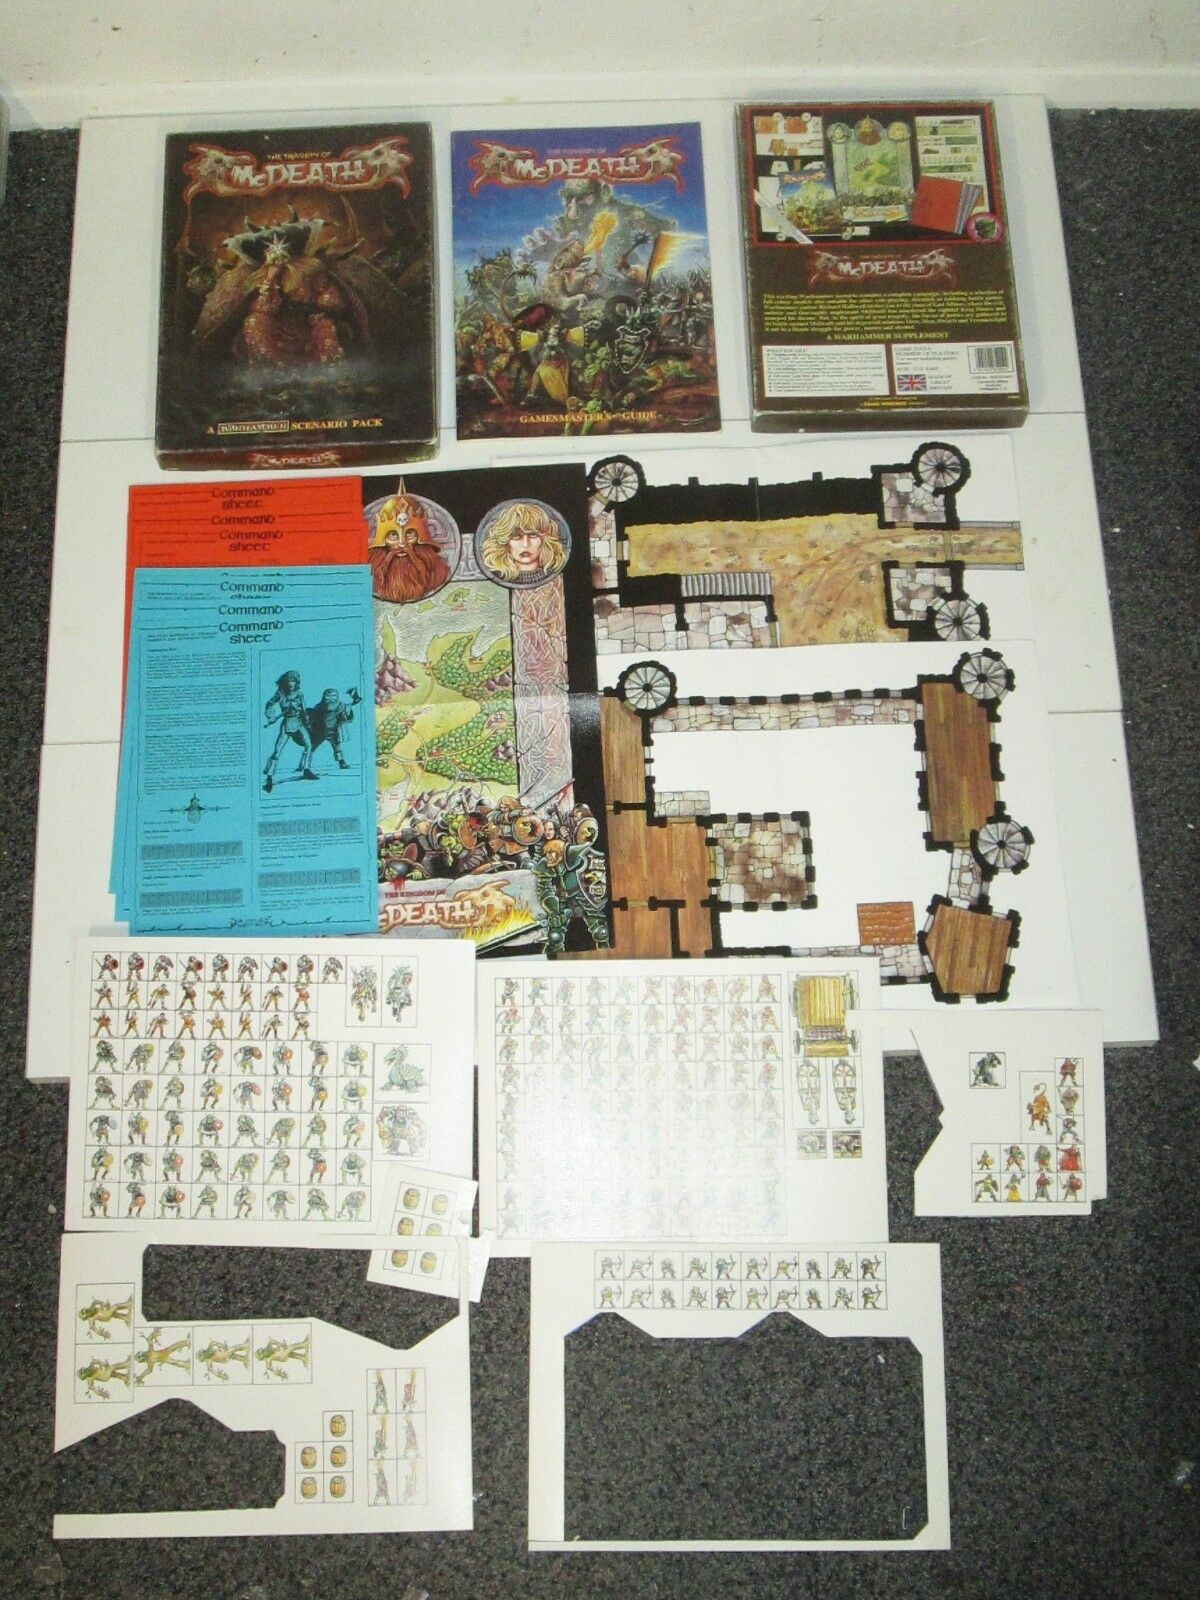 Warhammer Fantasy 1986 Scenario Pack - The Tragedy of McDeath